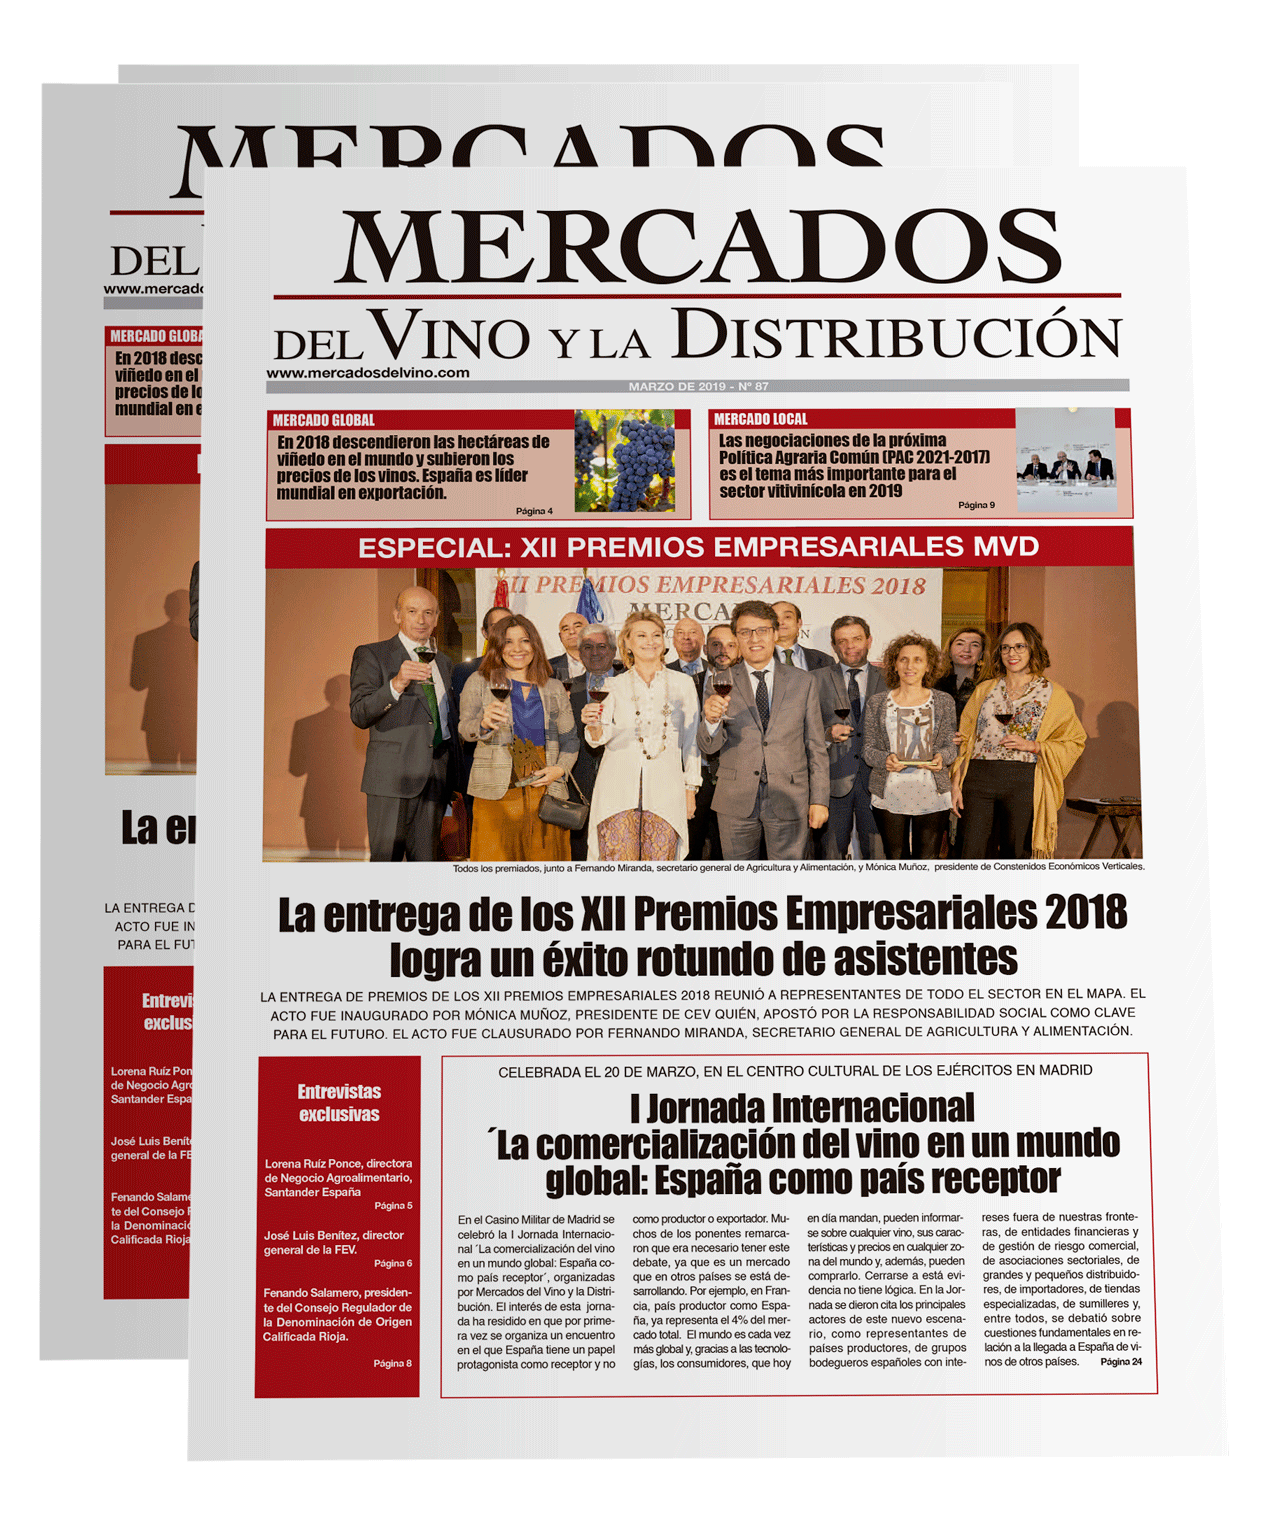 new-magazine-mercados-periodico